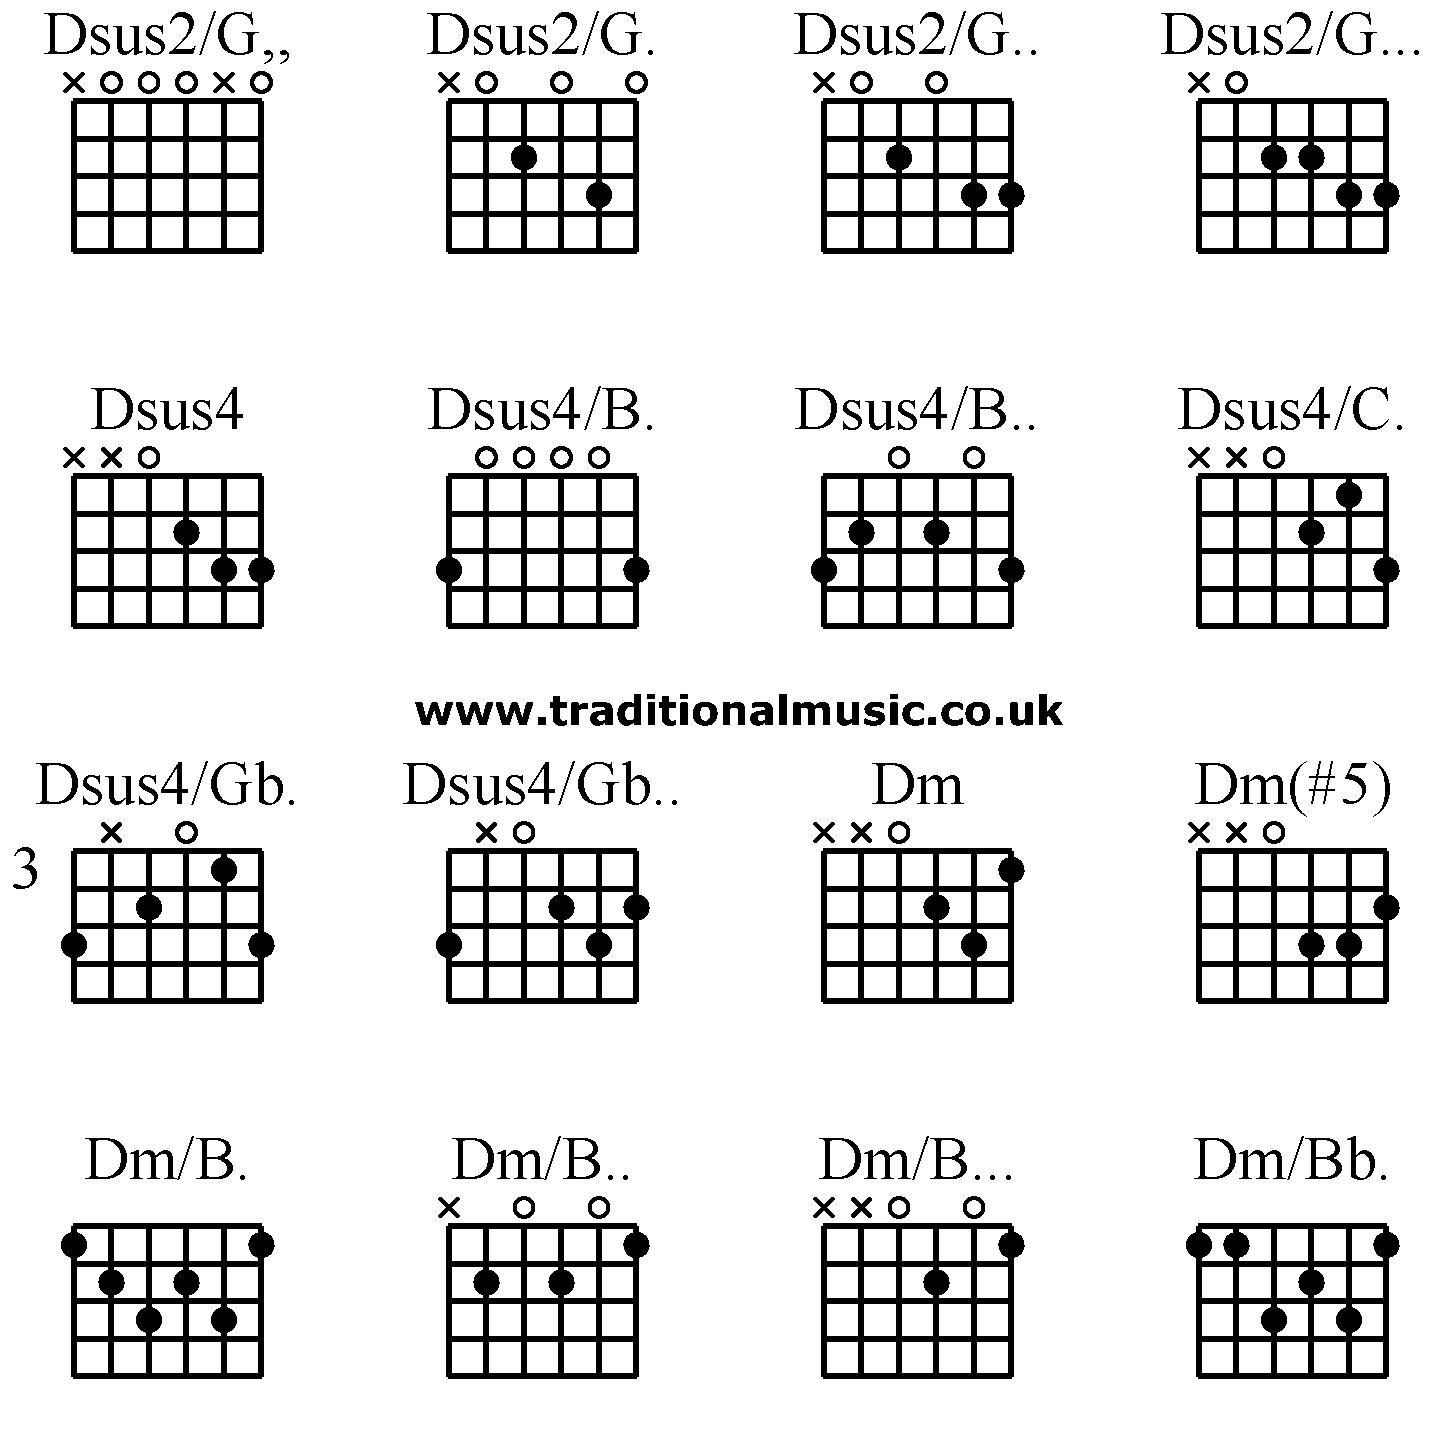 Advanced Guitar Chords Dsus2 G Dsus2 G Dsus2 G Dsus2